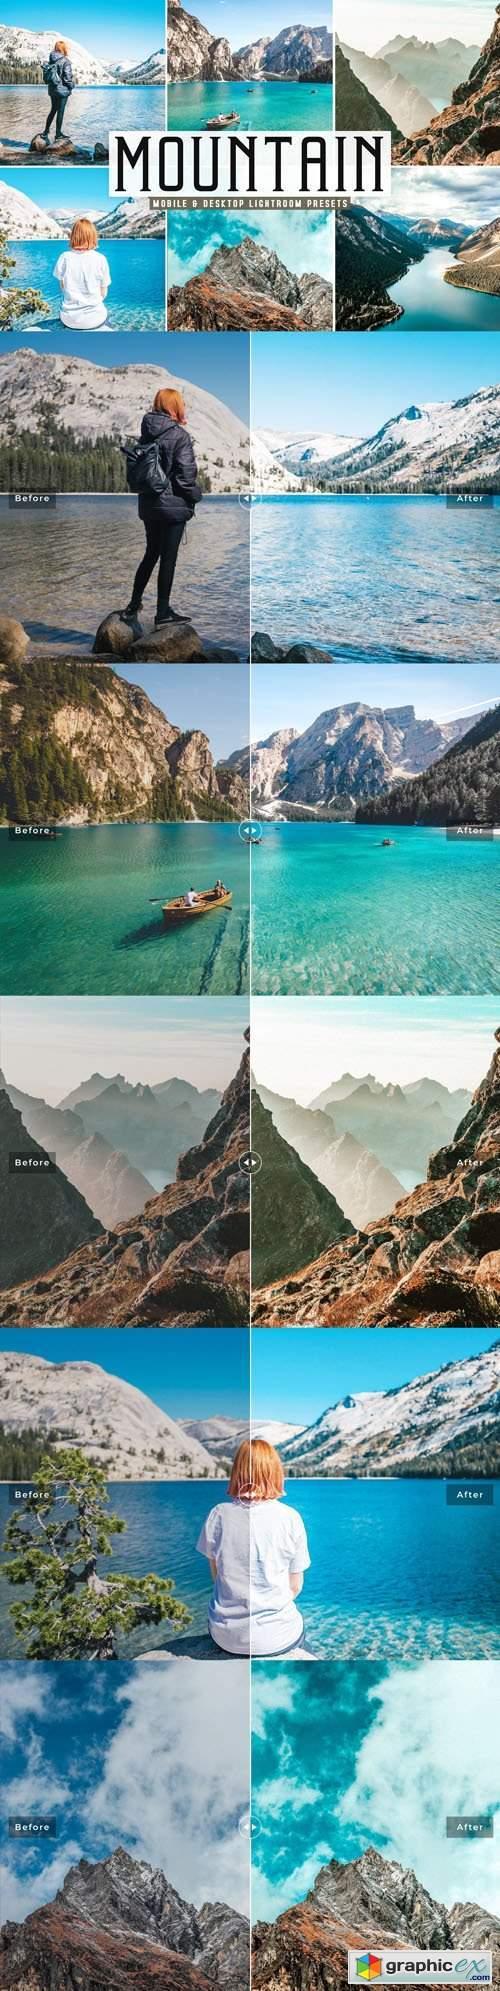 Mountain Pro Lightroom Presets + Photoshop Actions [Mobile & Desktop]